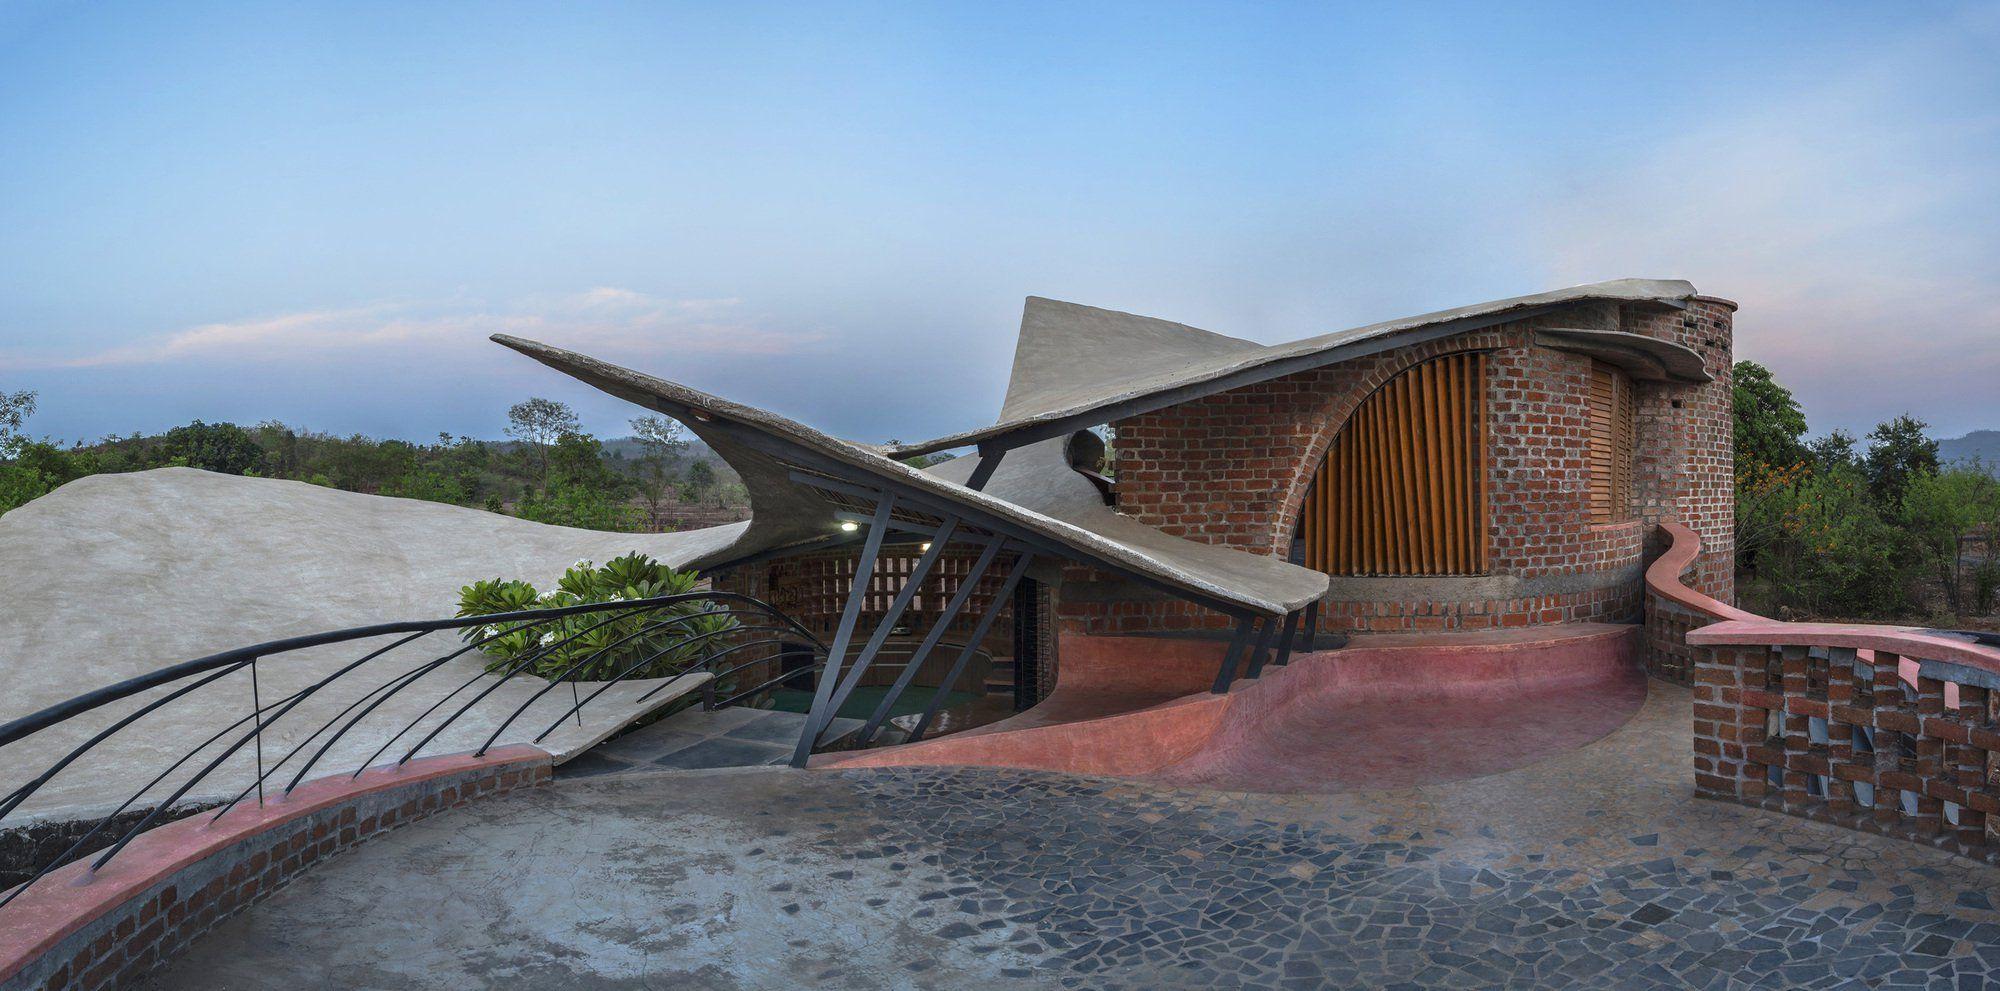 Brick House In Wada, Maharashtra, India 1 Backsteinbau